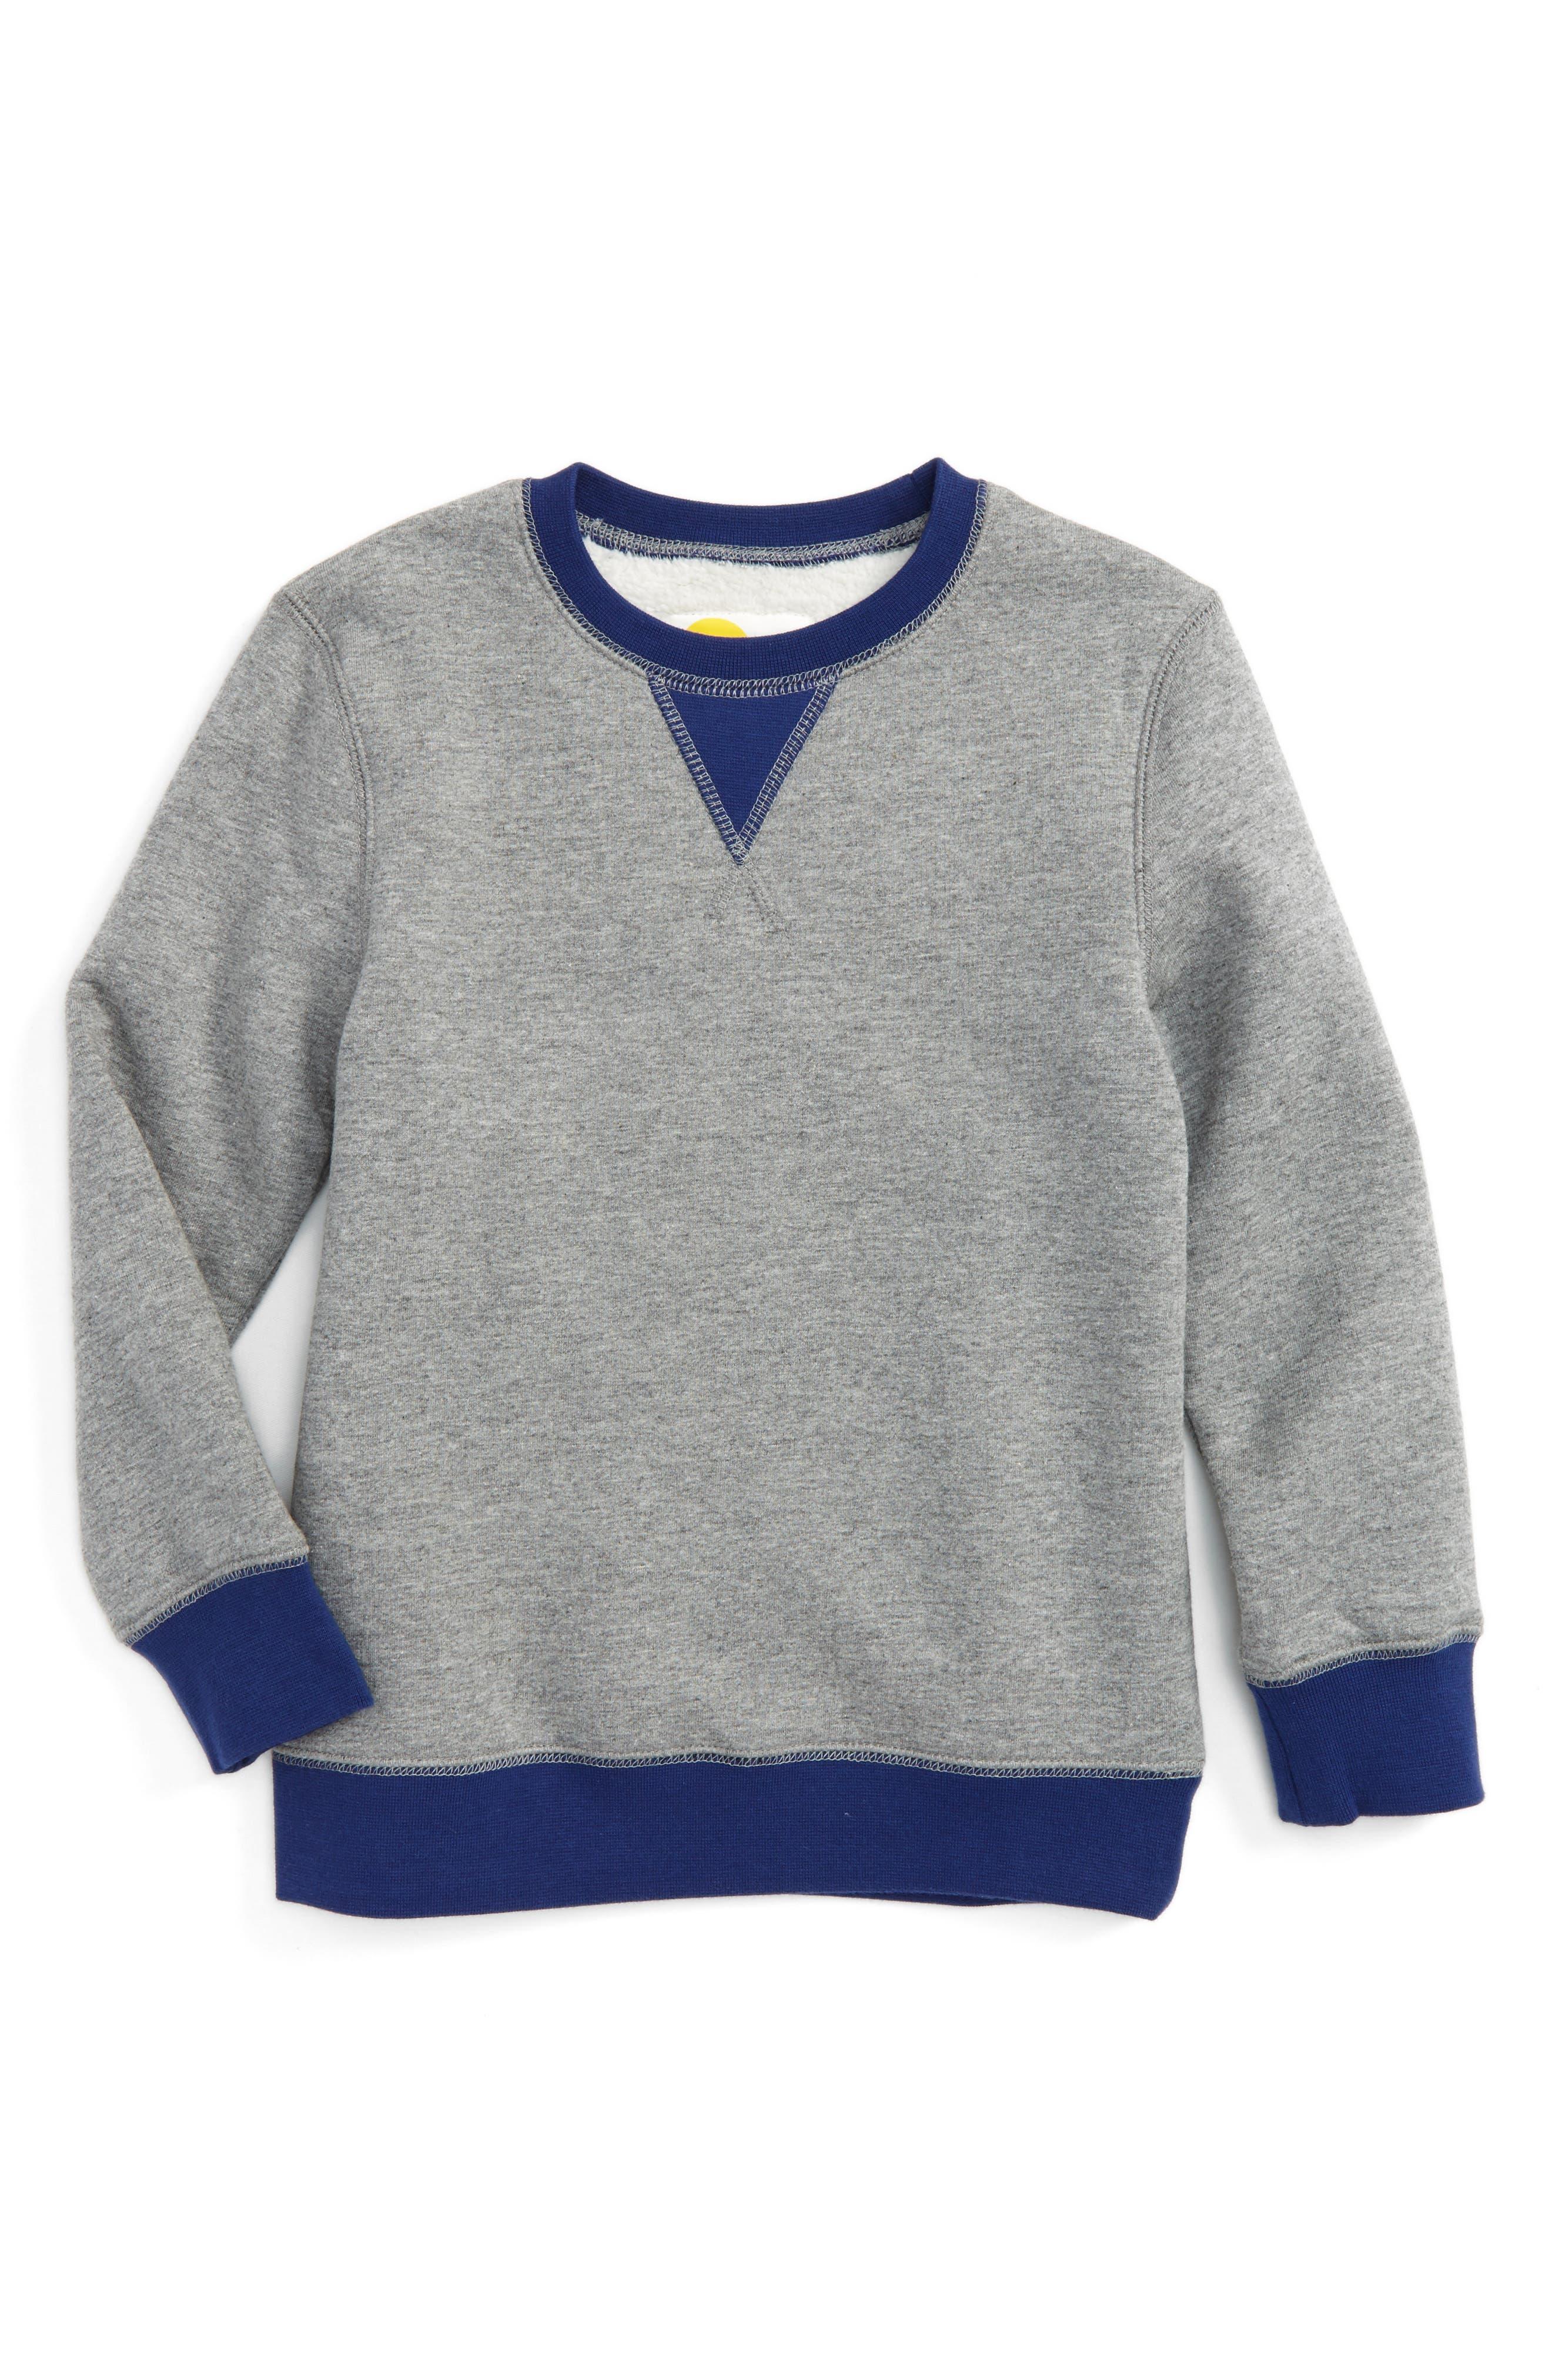 Alternate Image 1 Selected - Mini Boden Shaggy Lined Sweatshirt (Little Boys & Big Boys)